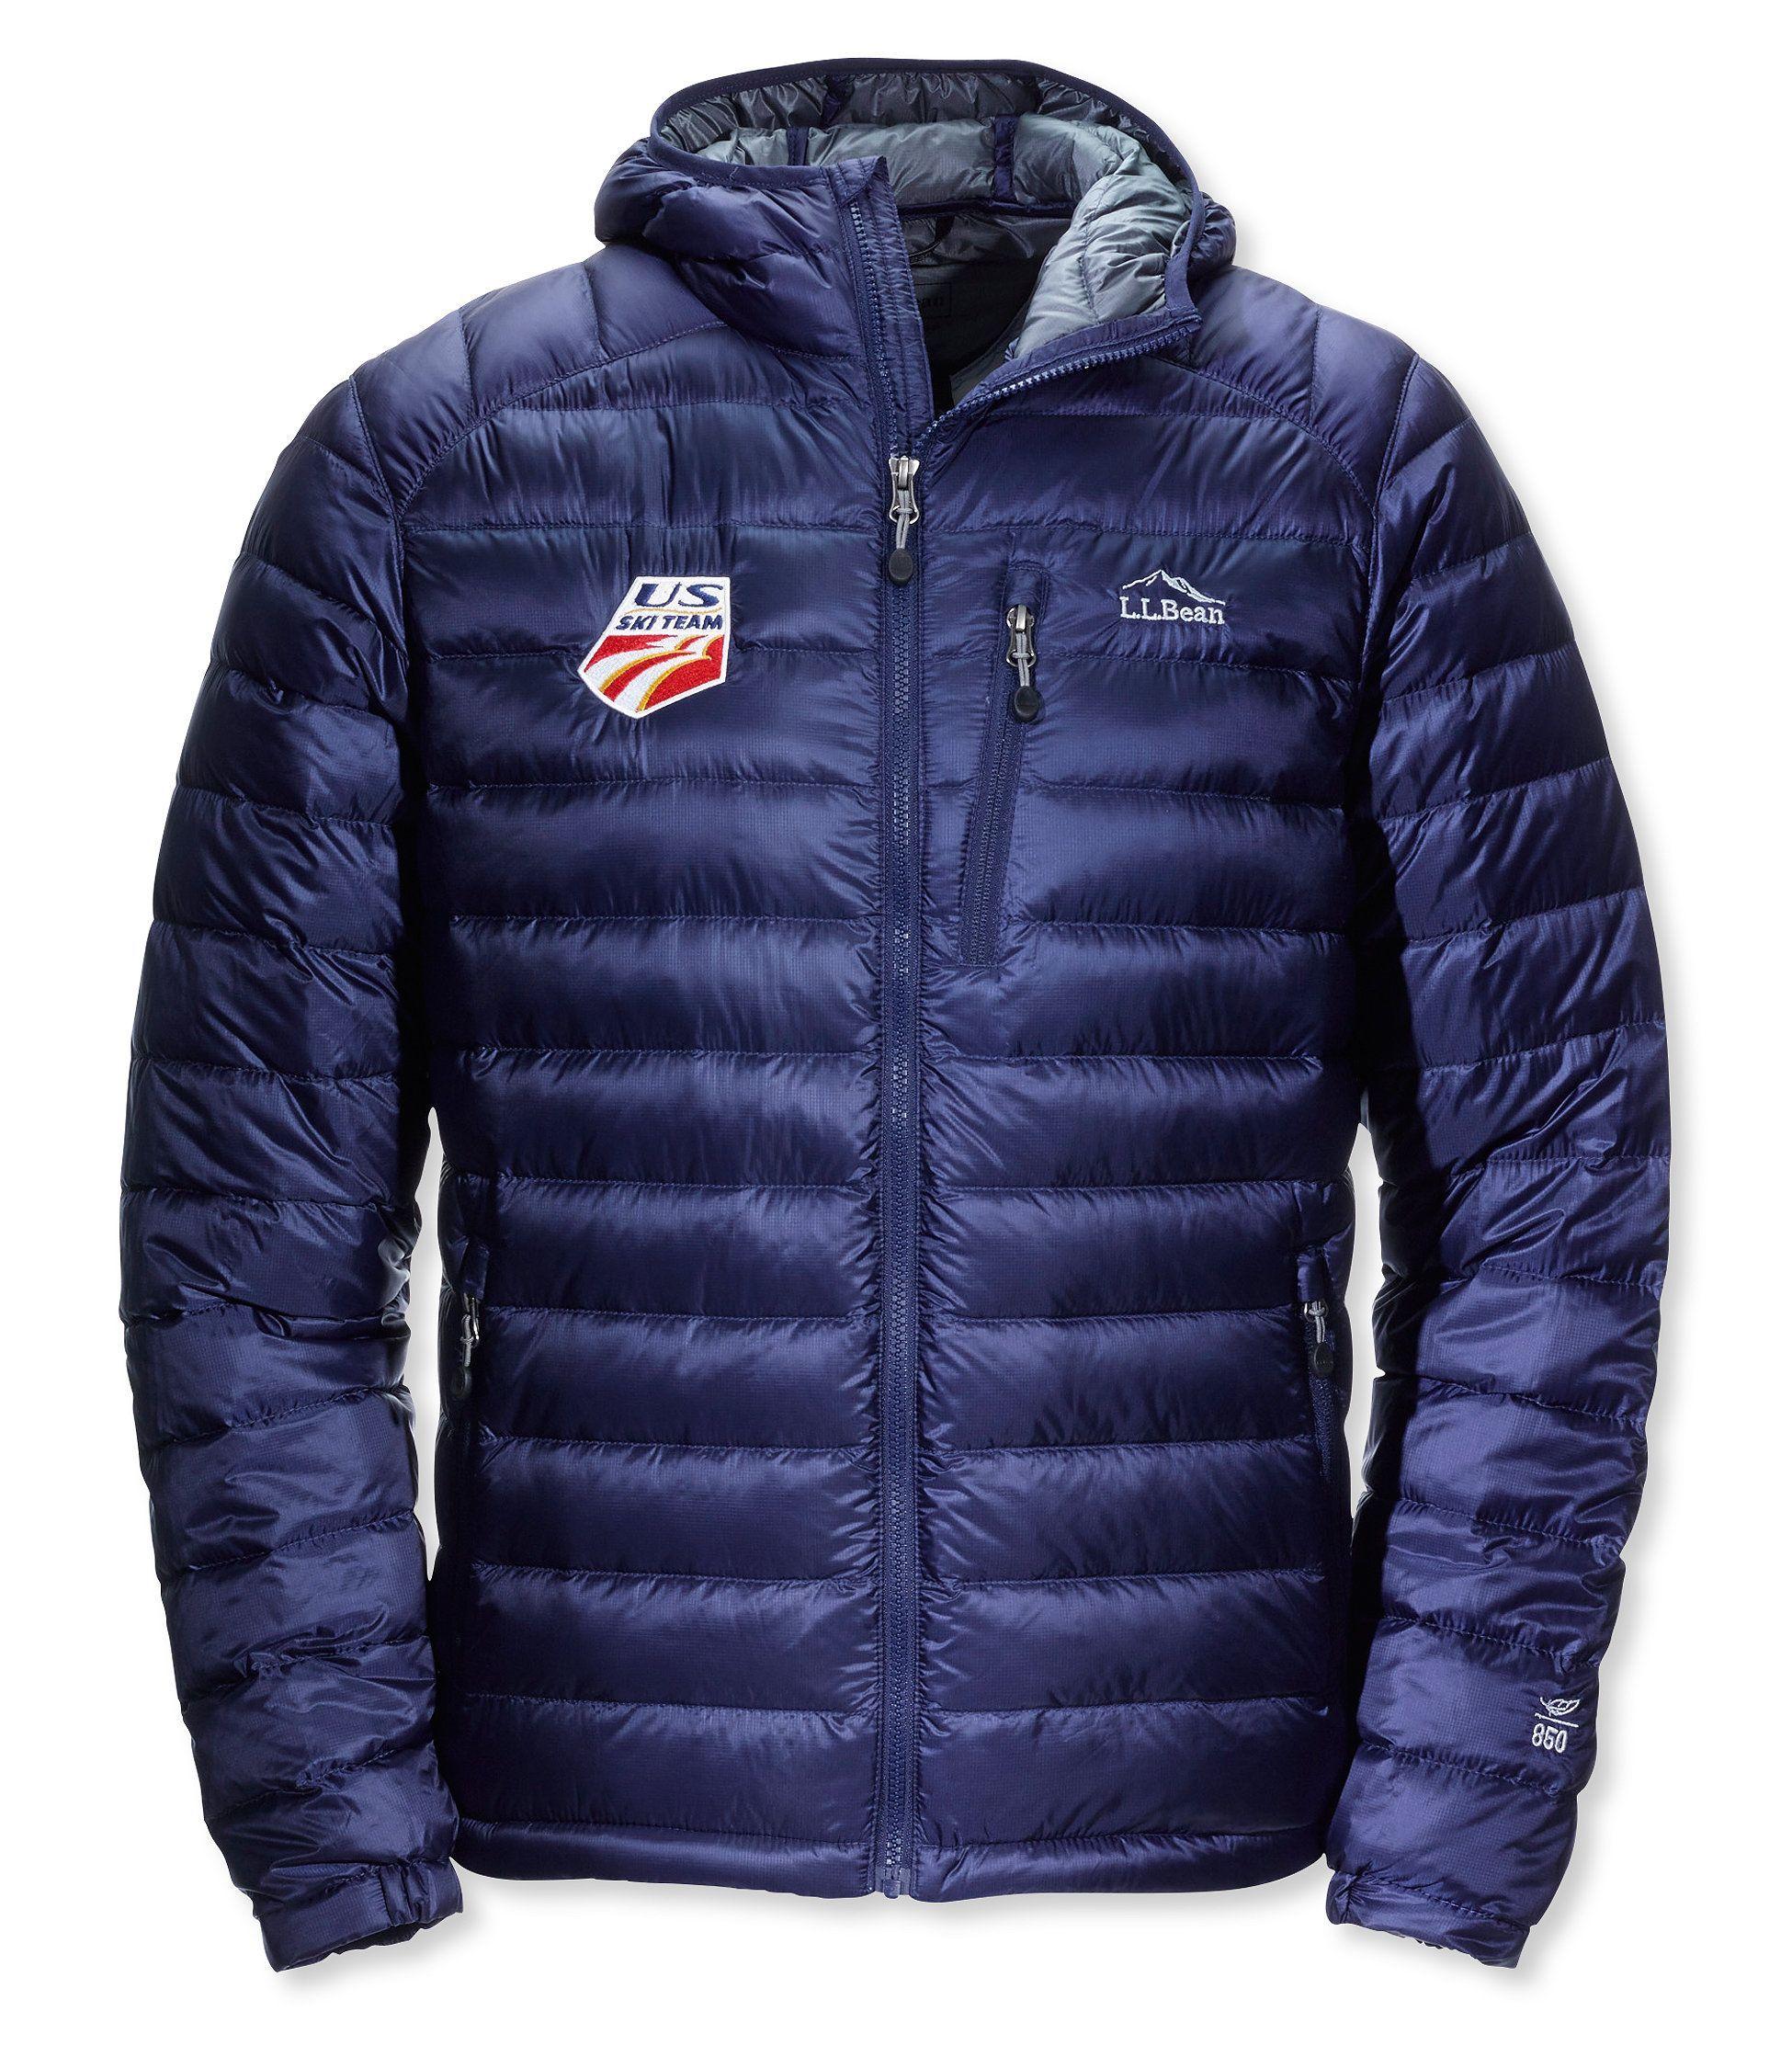 Ultralight 850 Down Hooded Jacket U S Ski Team Men S Regular Mens Outerwear Jacket Bomber Jacket Men Mens Outerwear [ 2250 x 1950 Pixel ]